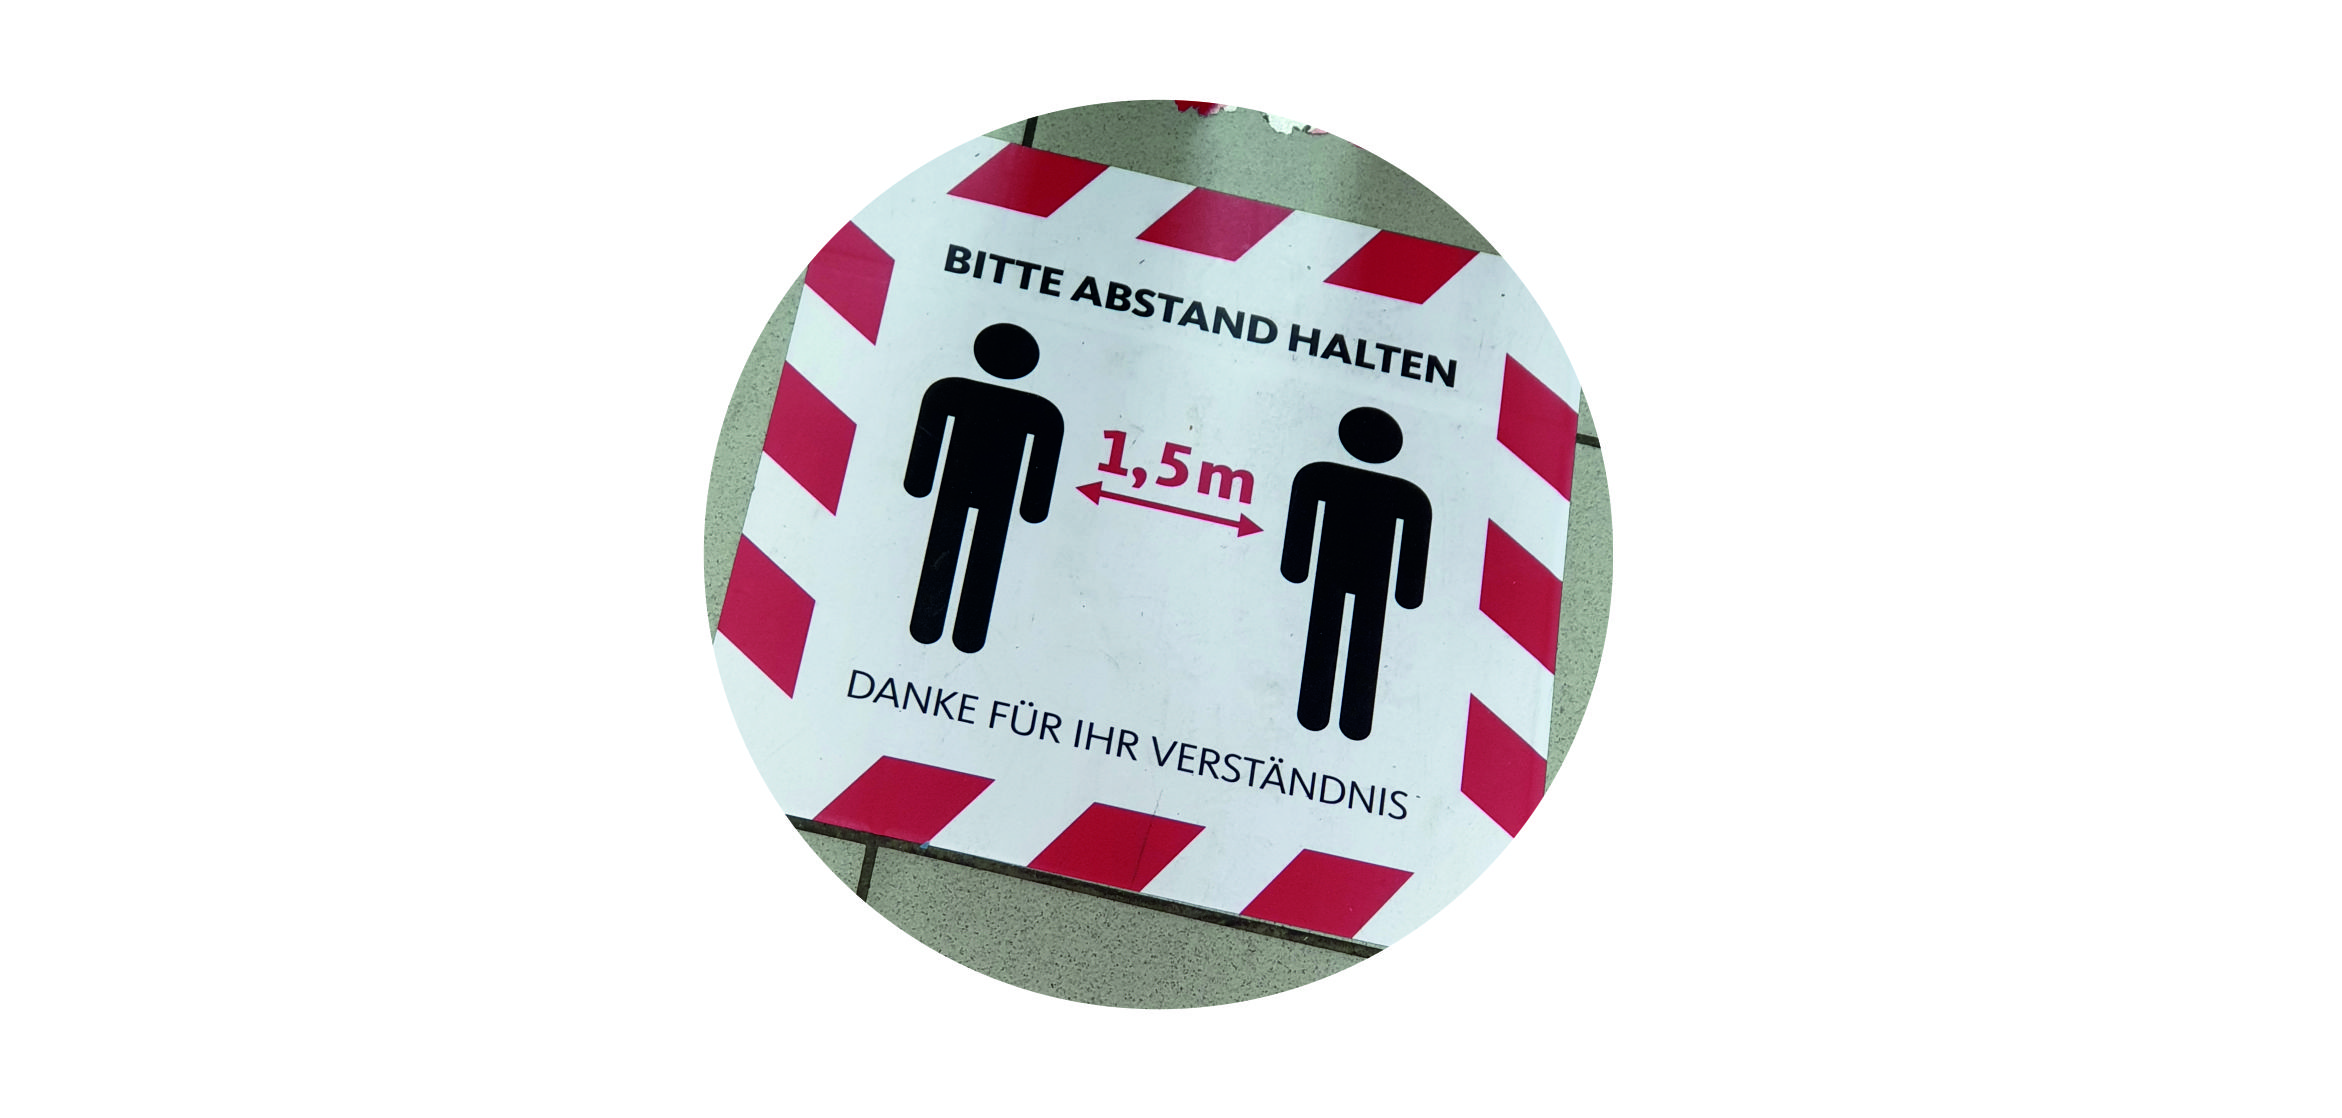 Bodenaufkleber Paradigma.media Werbung Berlin